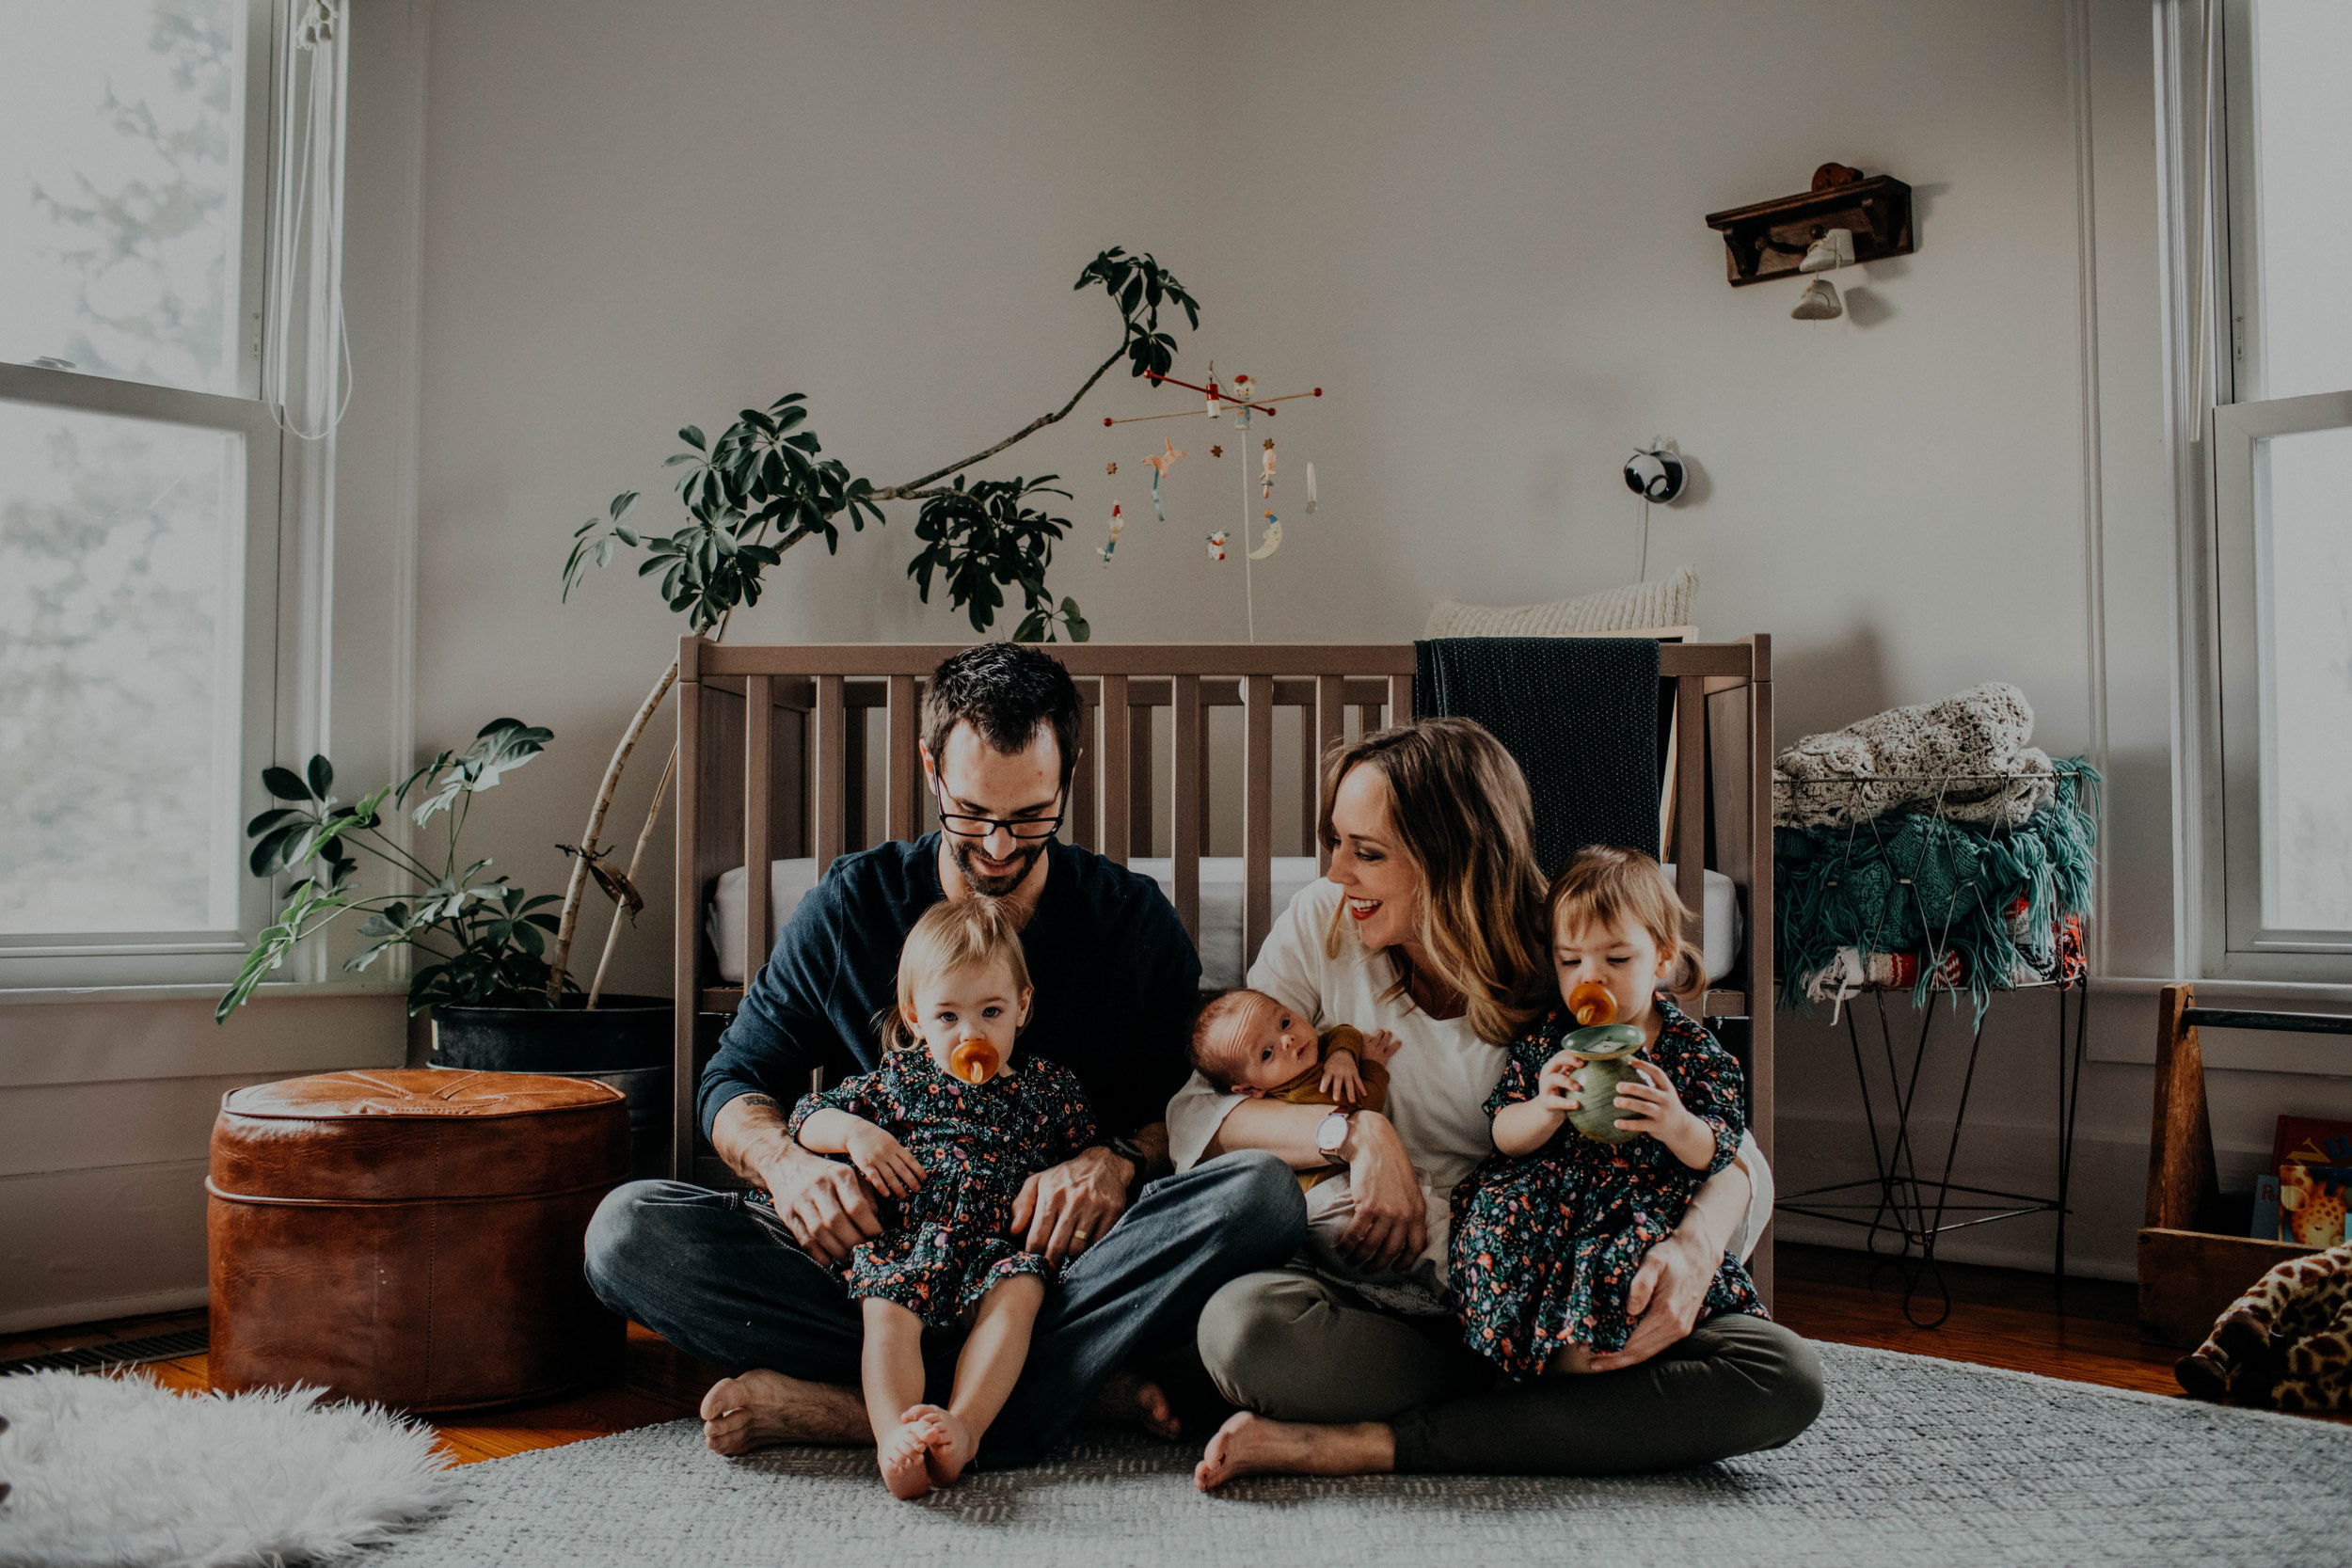 columbus ohio lifestyle family photographer grace e jones photography69.jpg